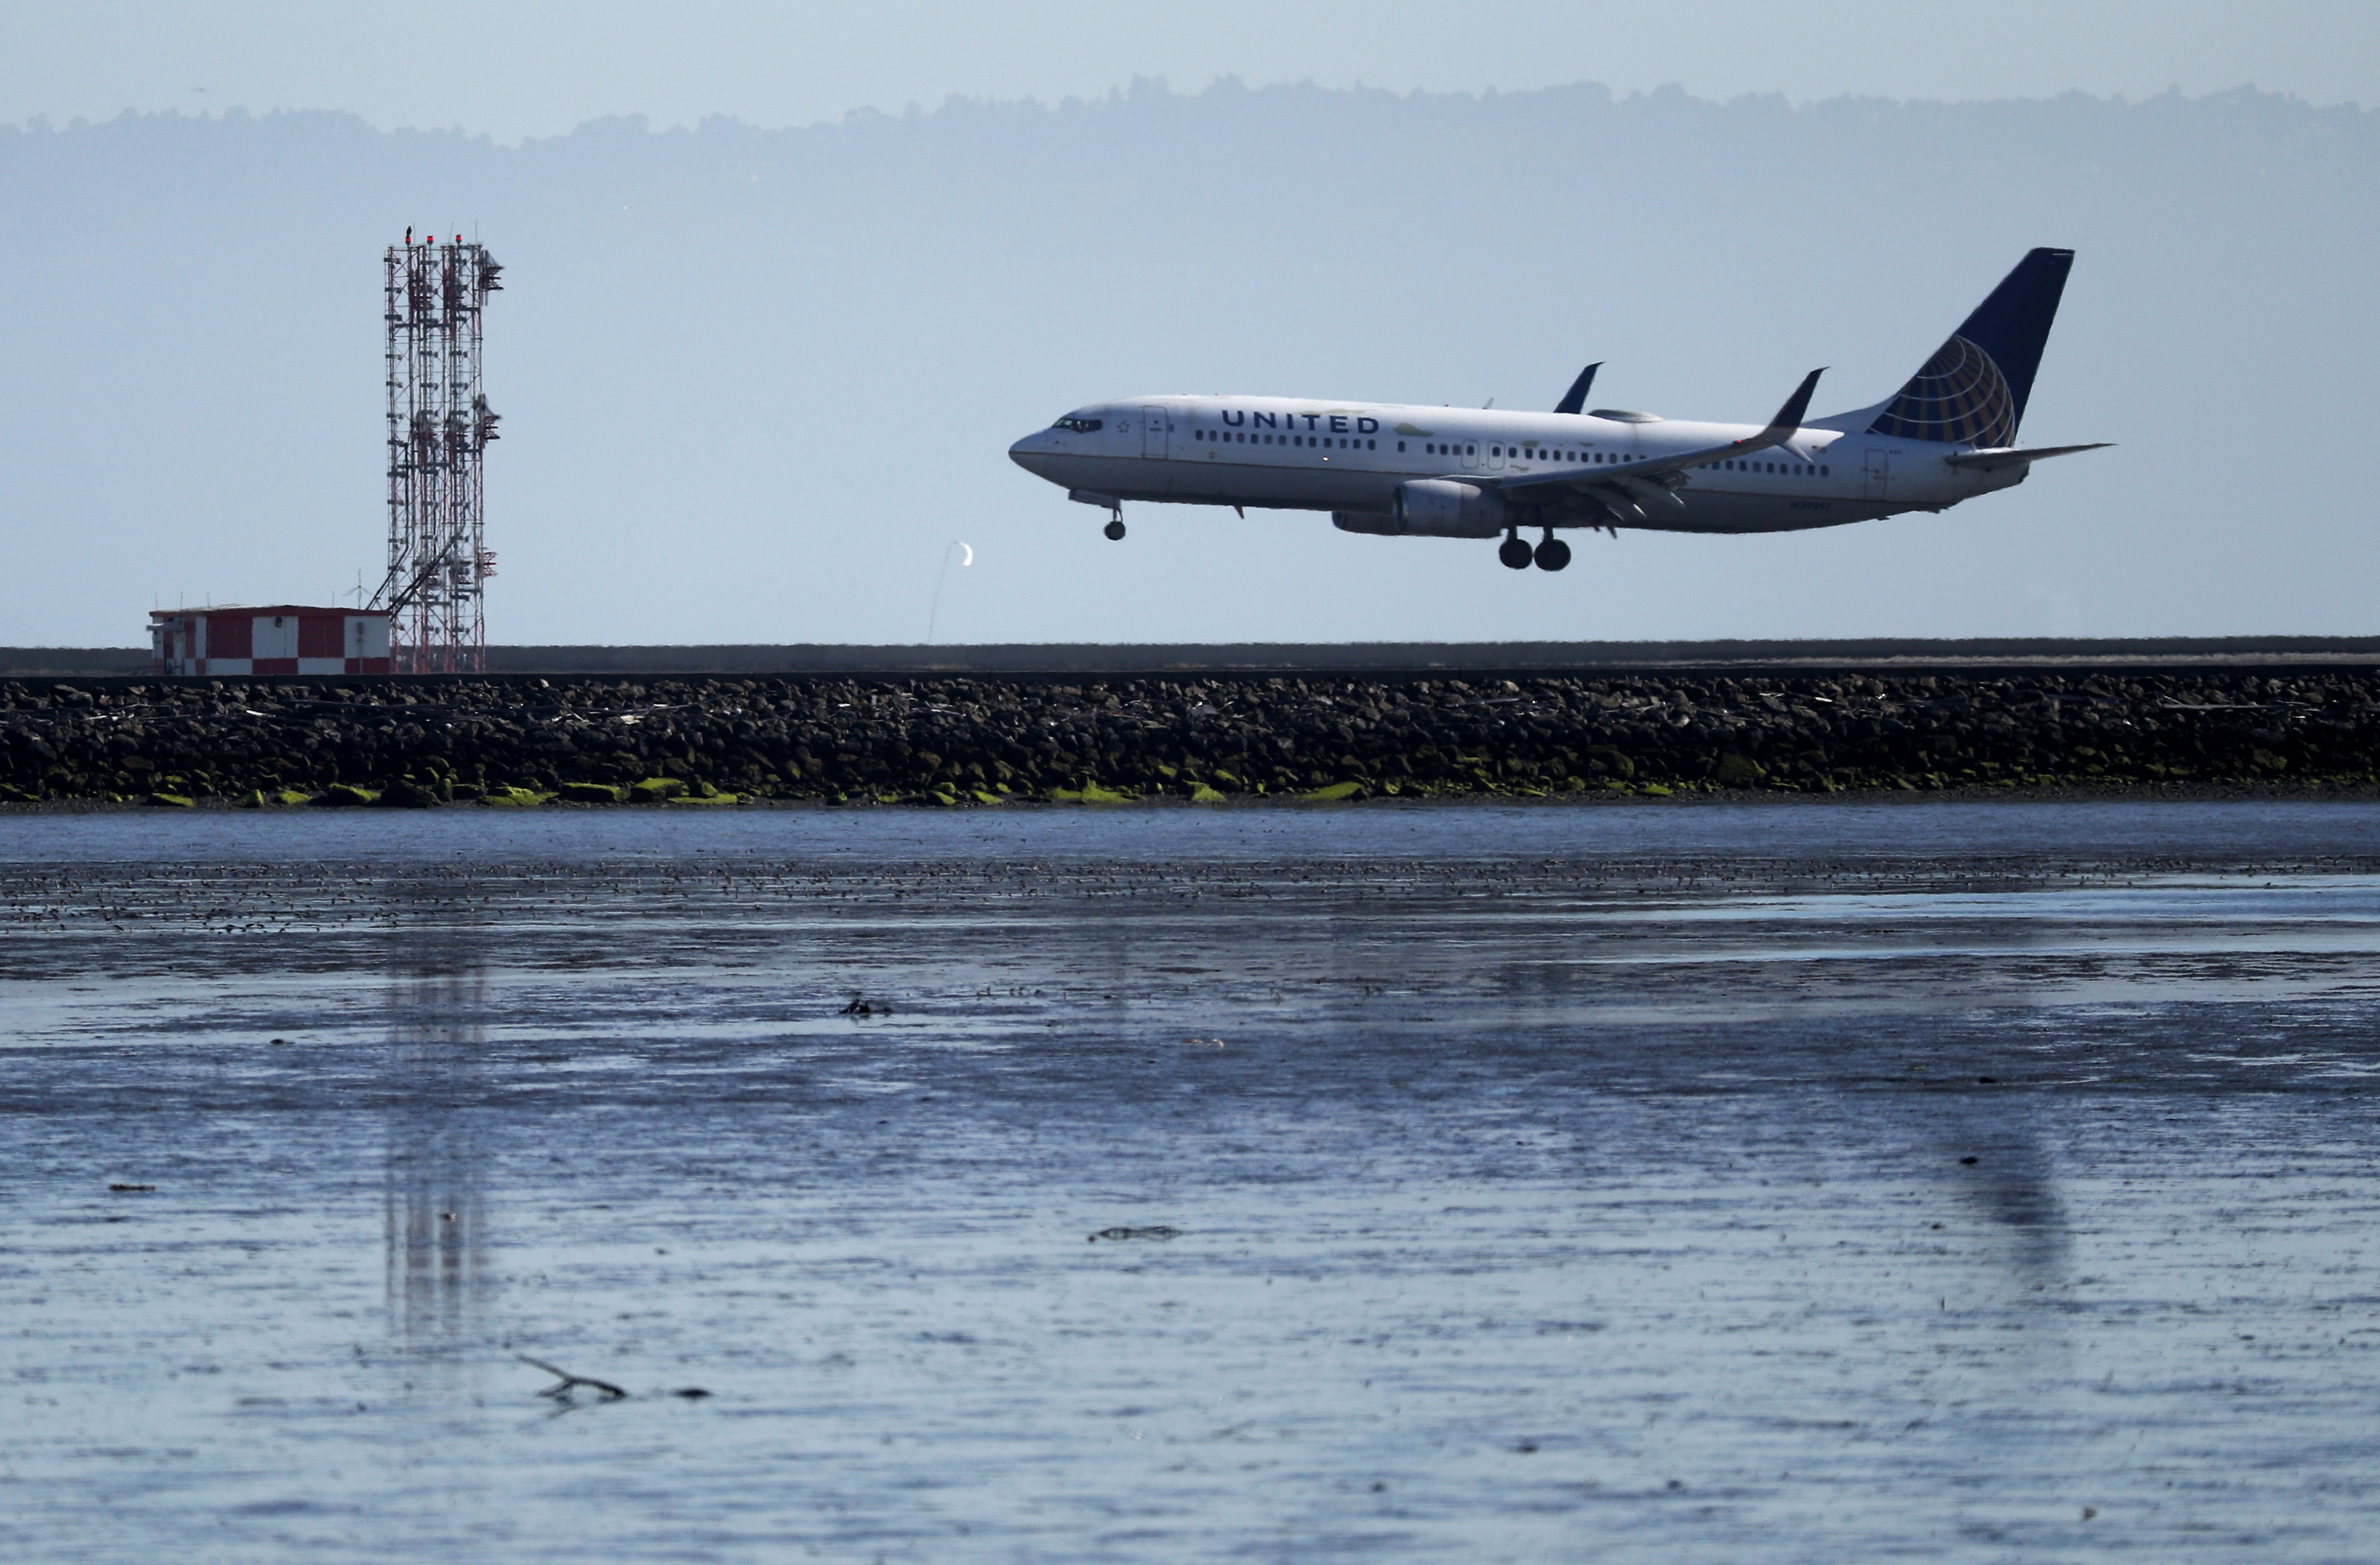 Boeing Q1 Profits Plummet 21 Percent Due To 737 MAX Jet Failings